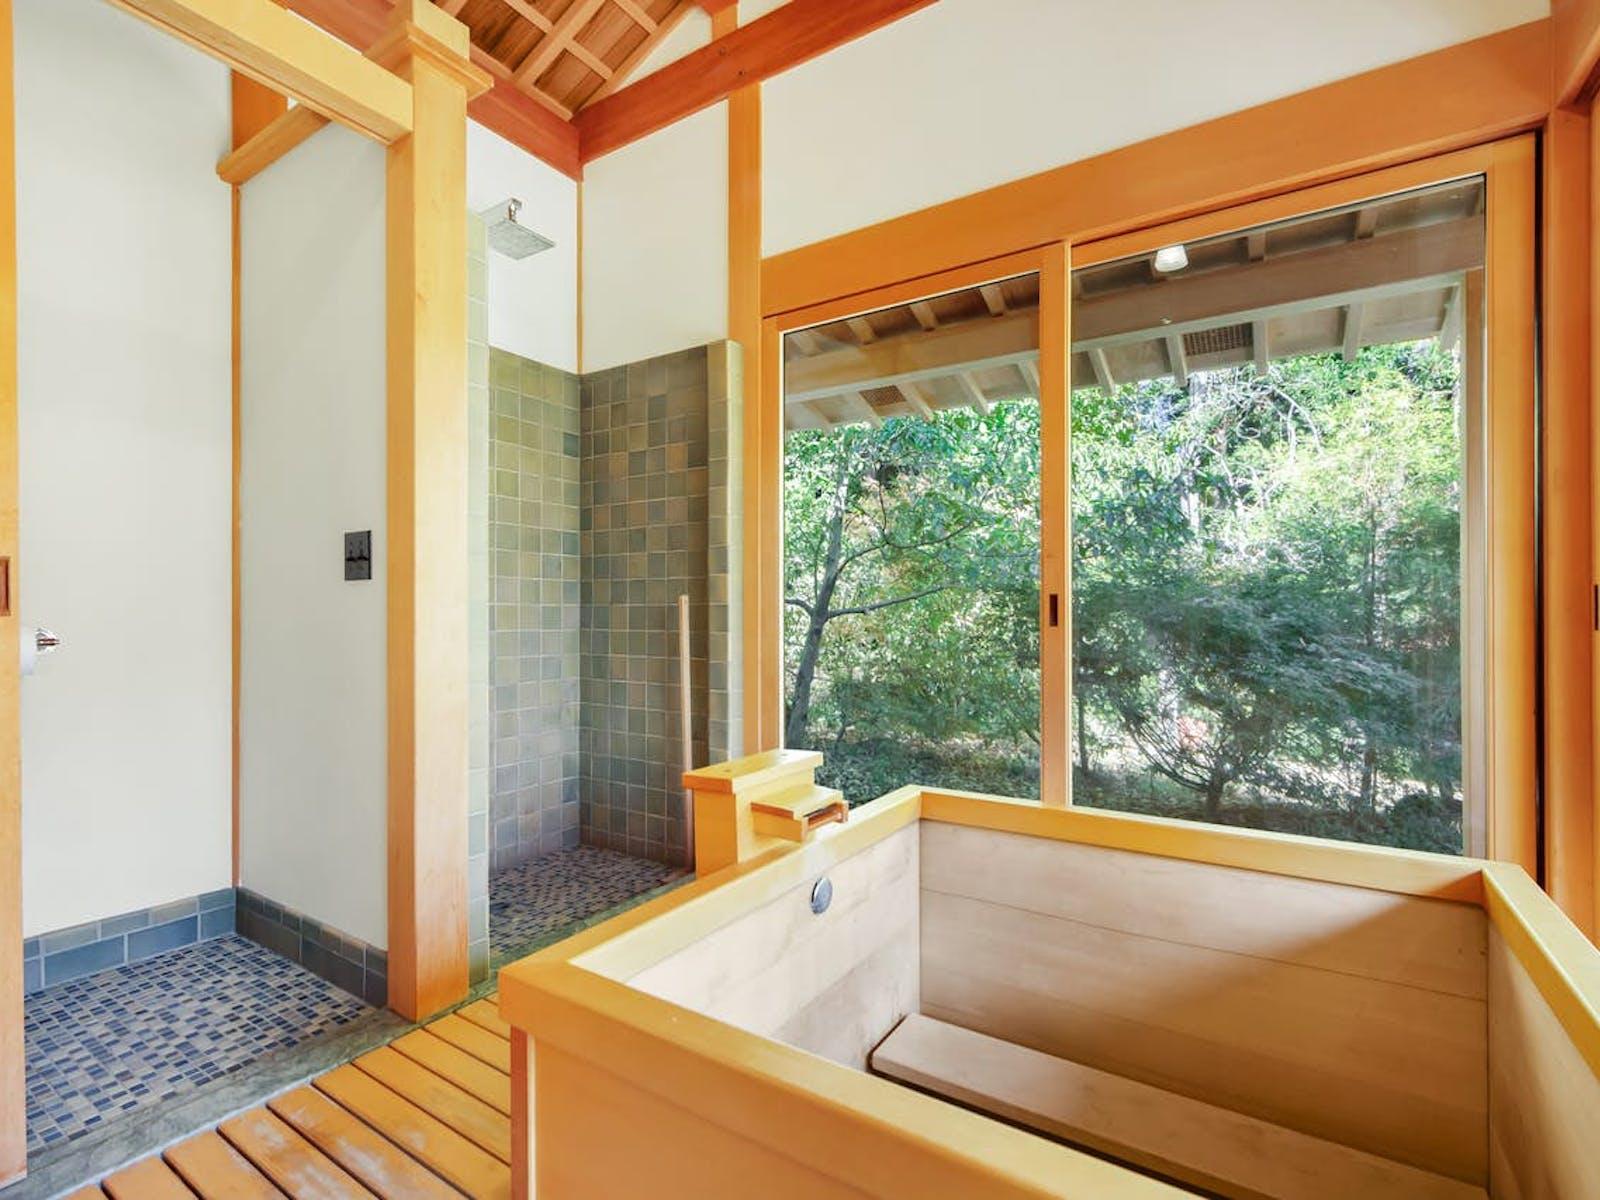 a traditional Japanese tea and bath house that includes a cedar soaking tub